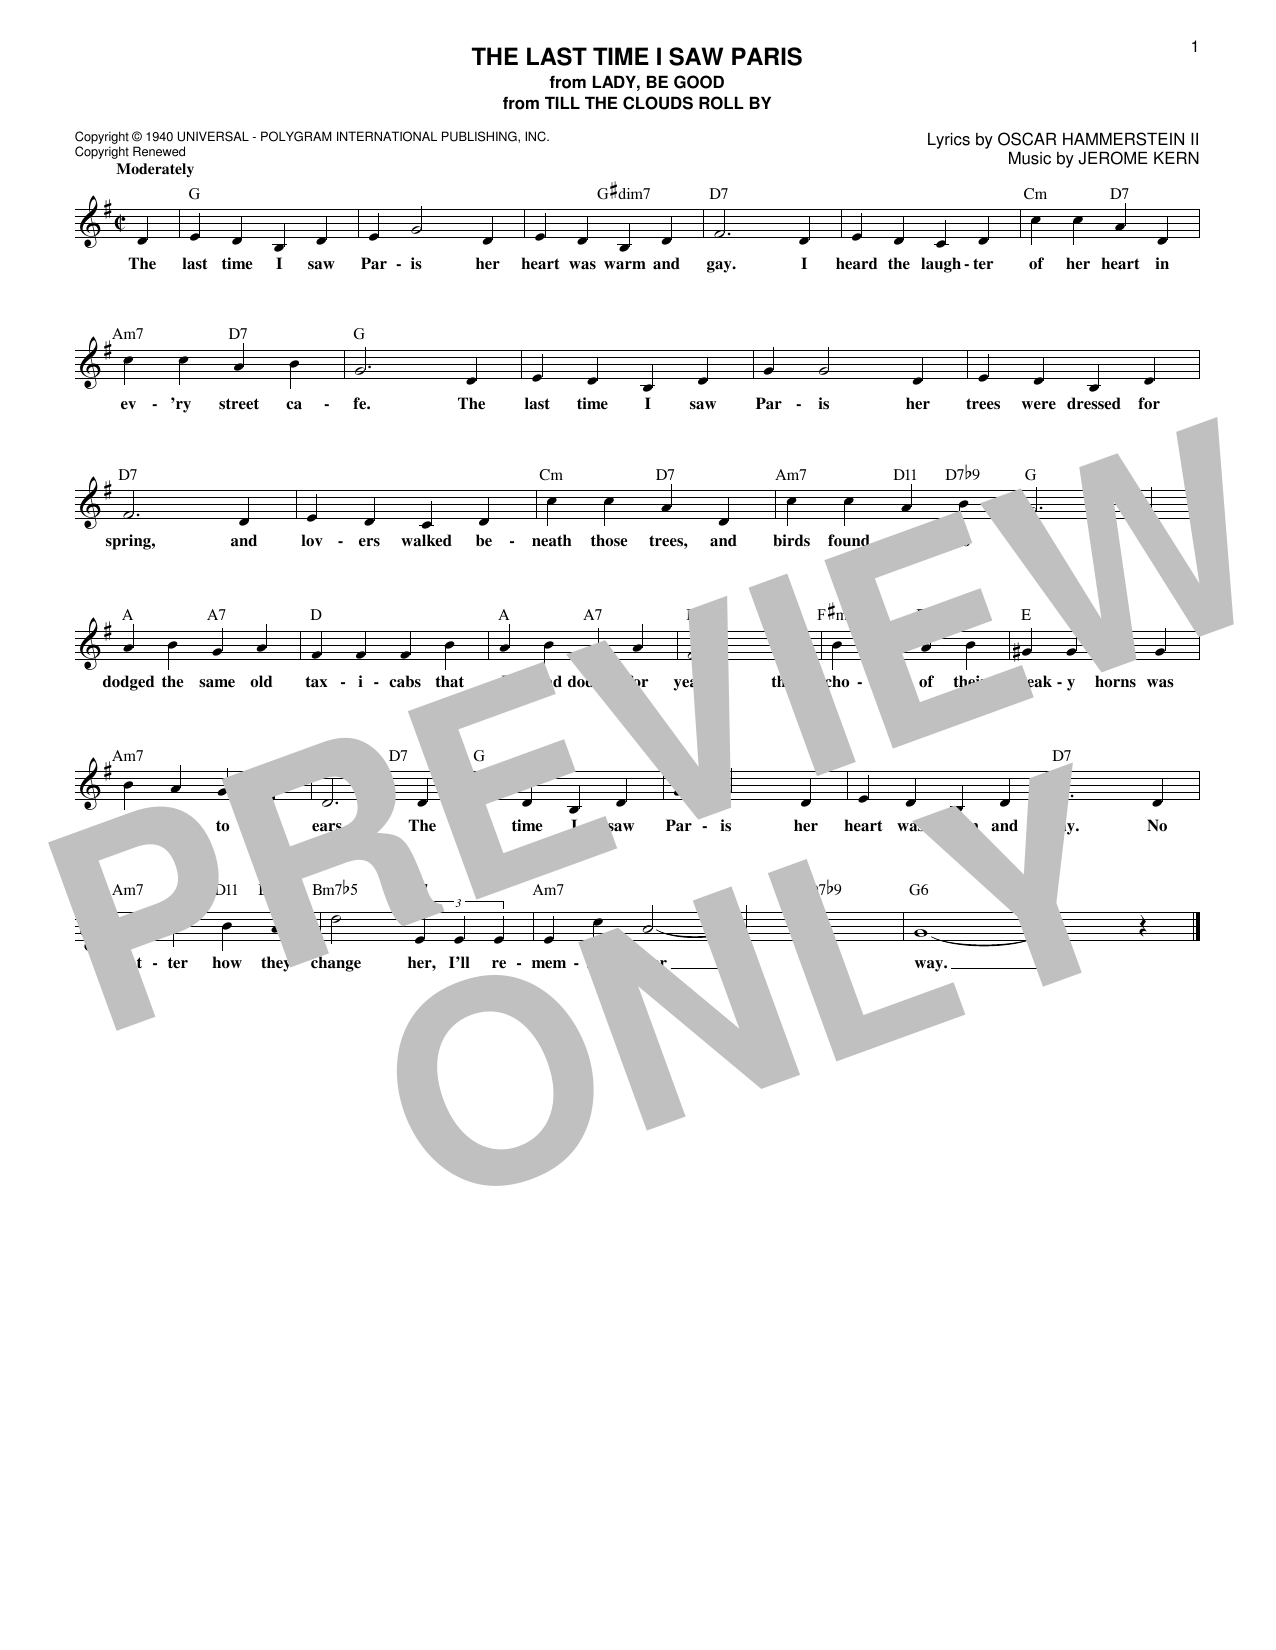 Oscar Hammerstein II & Jerome Kern The Last Time I Saw Paris sheet music notes printable PDF score